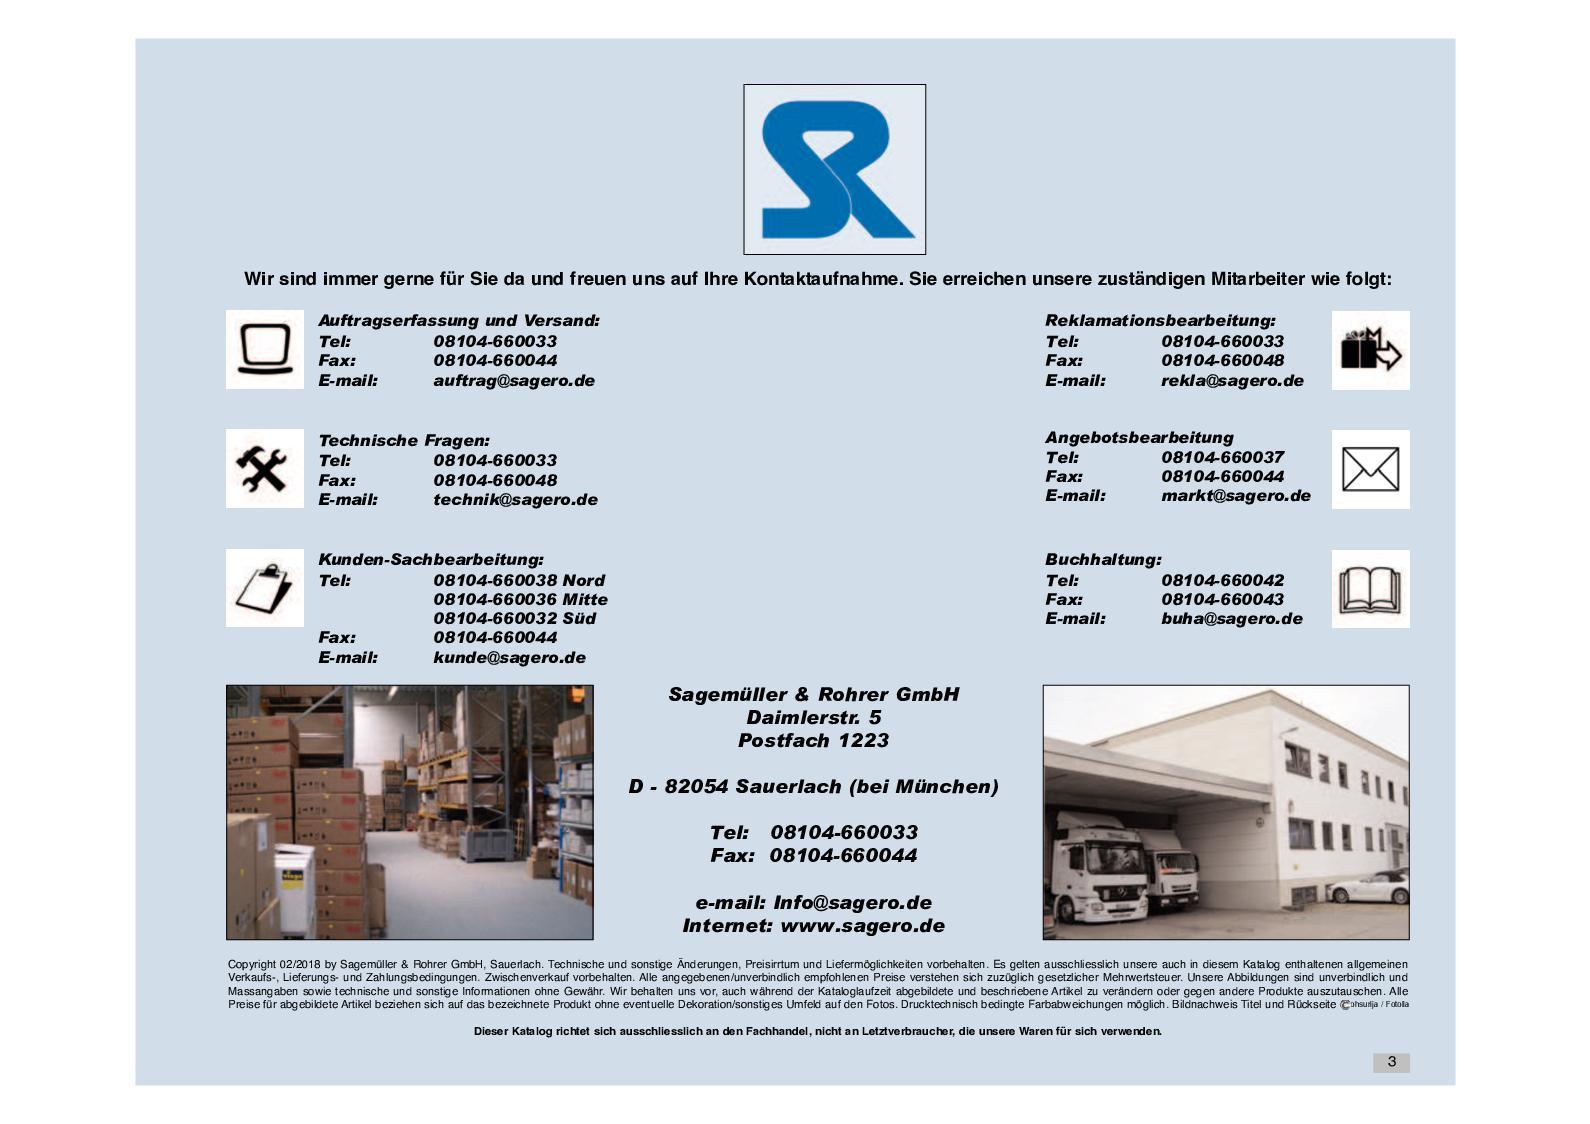 Full Size of Schubladeneinsatz Stecksystem Calamo Sagerohome 10 7 2018 Gepost Nederland Verkoopboek Sagero Regal Küche Wohnzimmer Schubladeneinsatz Stecksystem